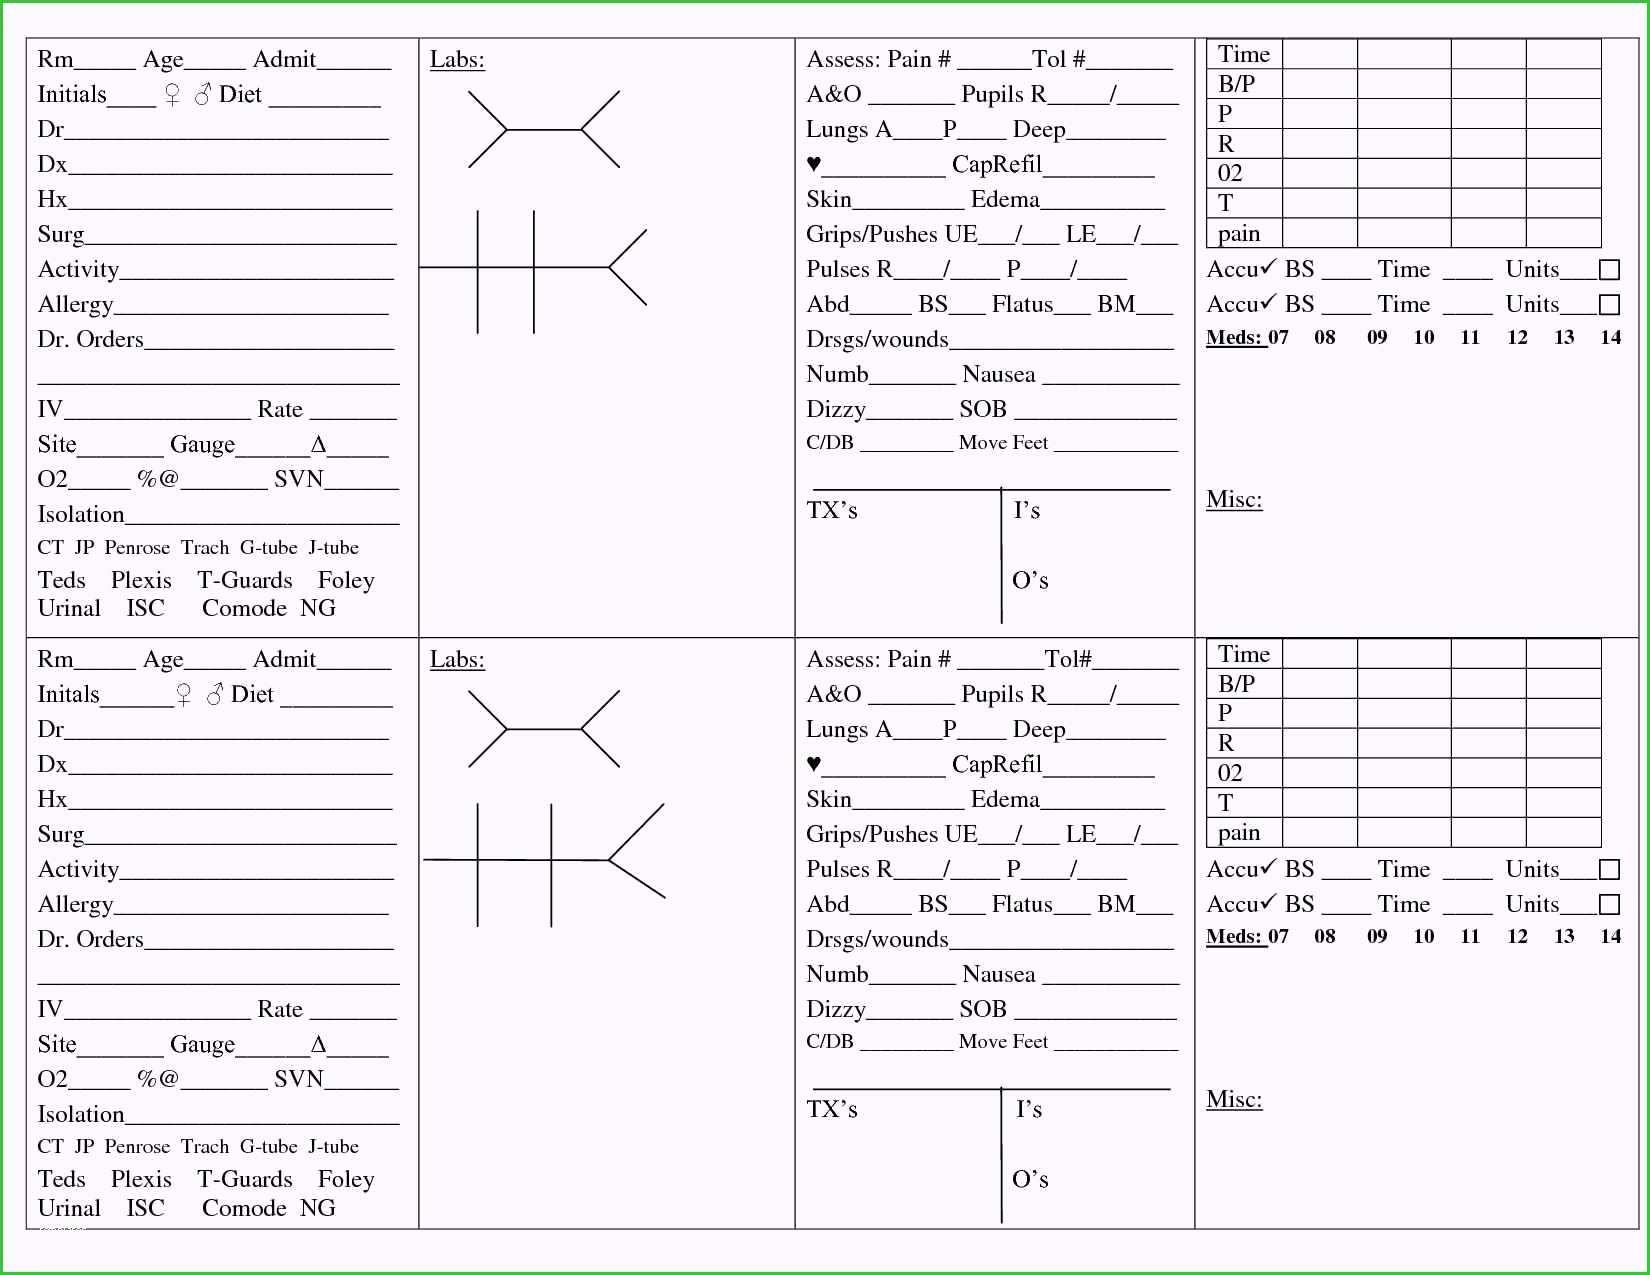 Nursing Shift Report Template New Gallery Nurse Sheet Intended For Nursing Report Sheet Template